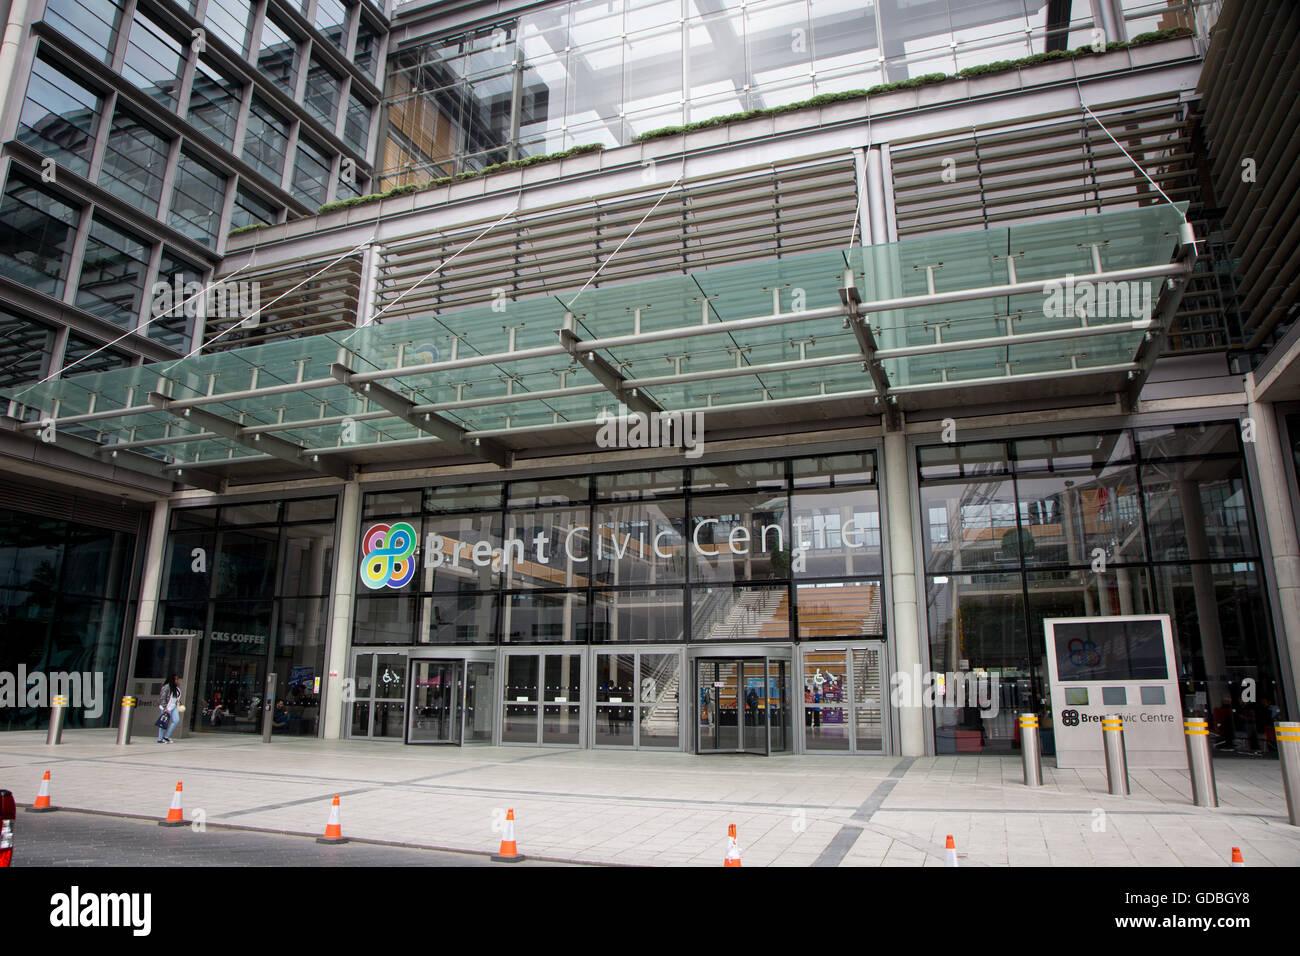 Brent Civic Centre front entrance exterior - Stock Image